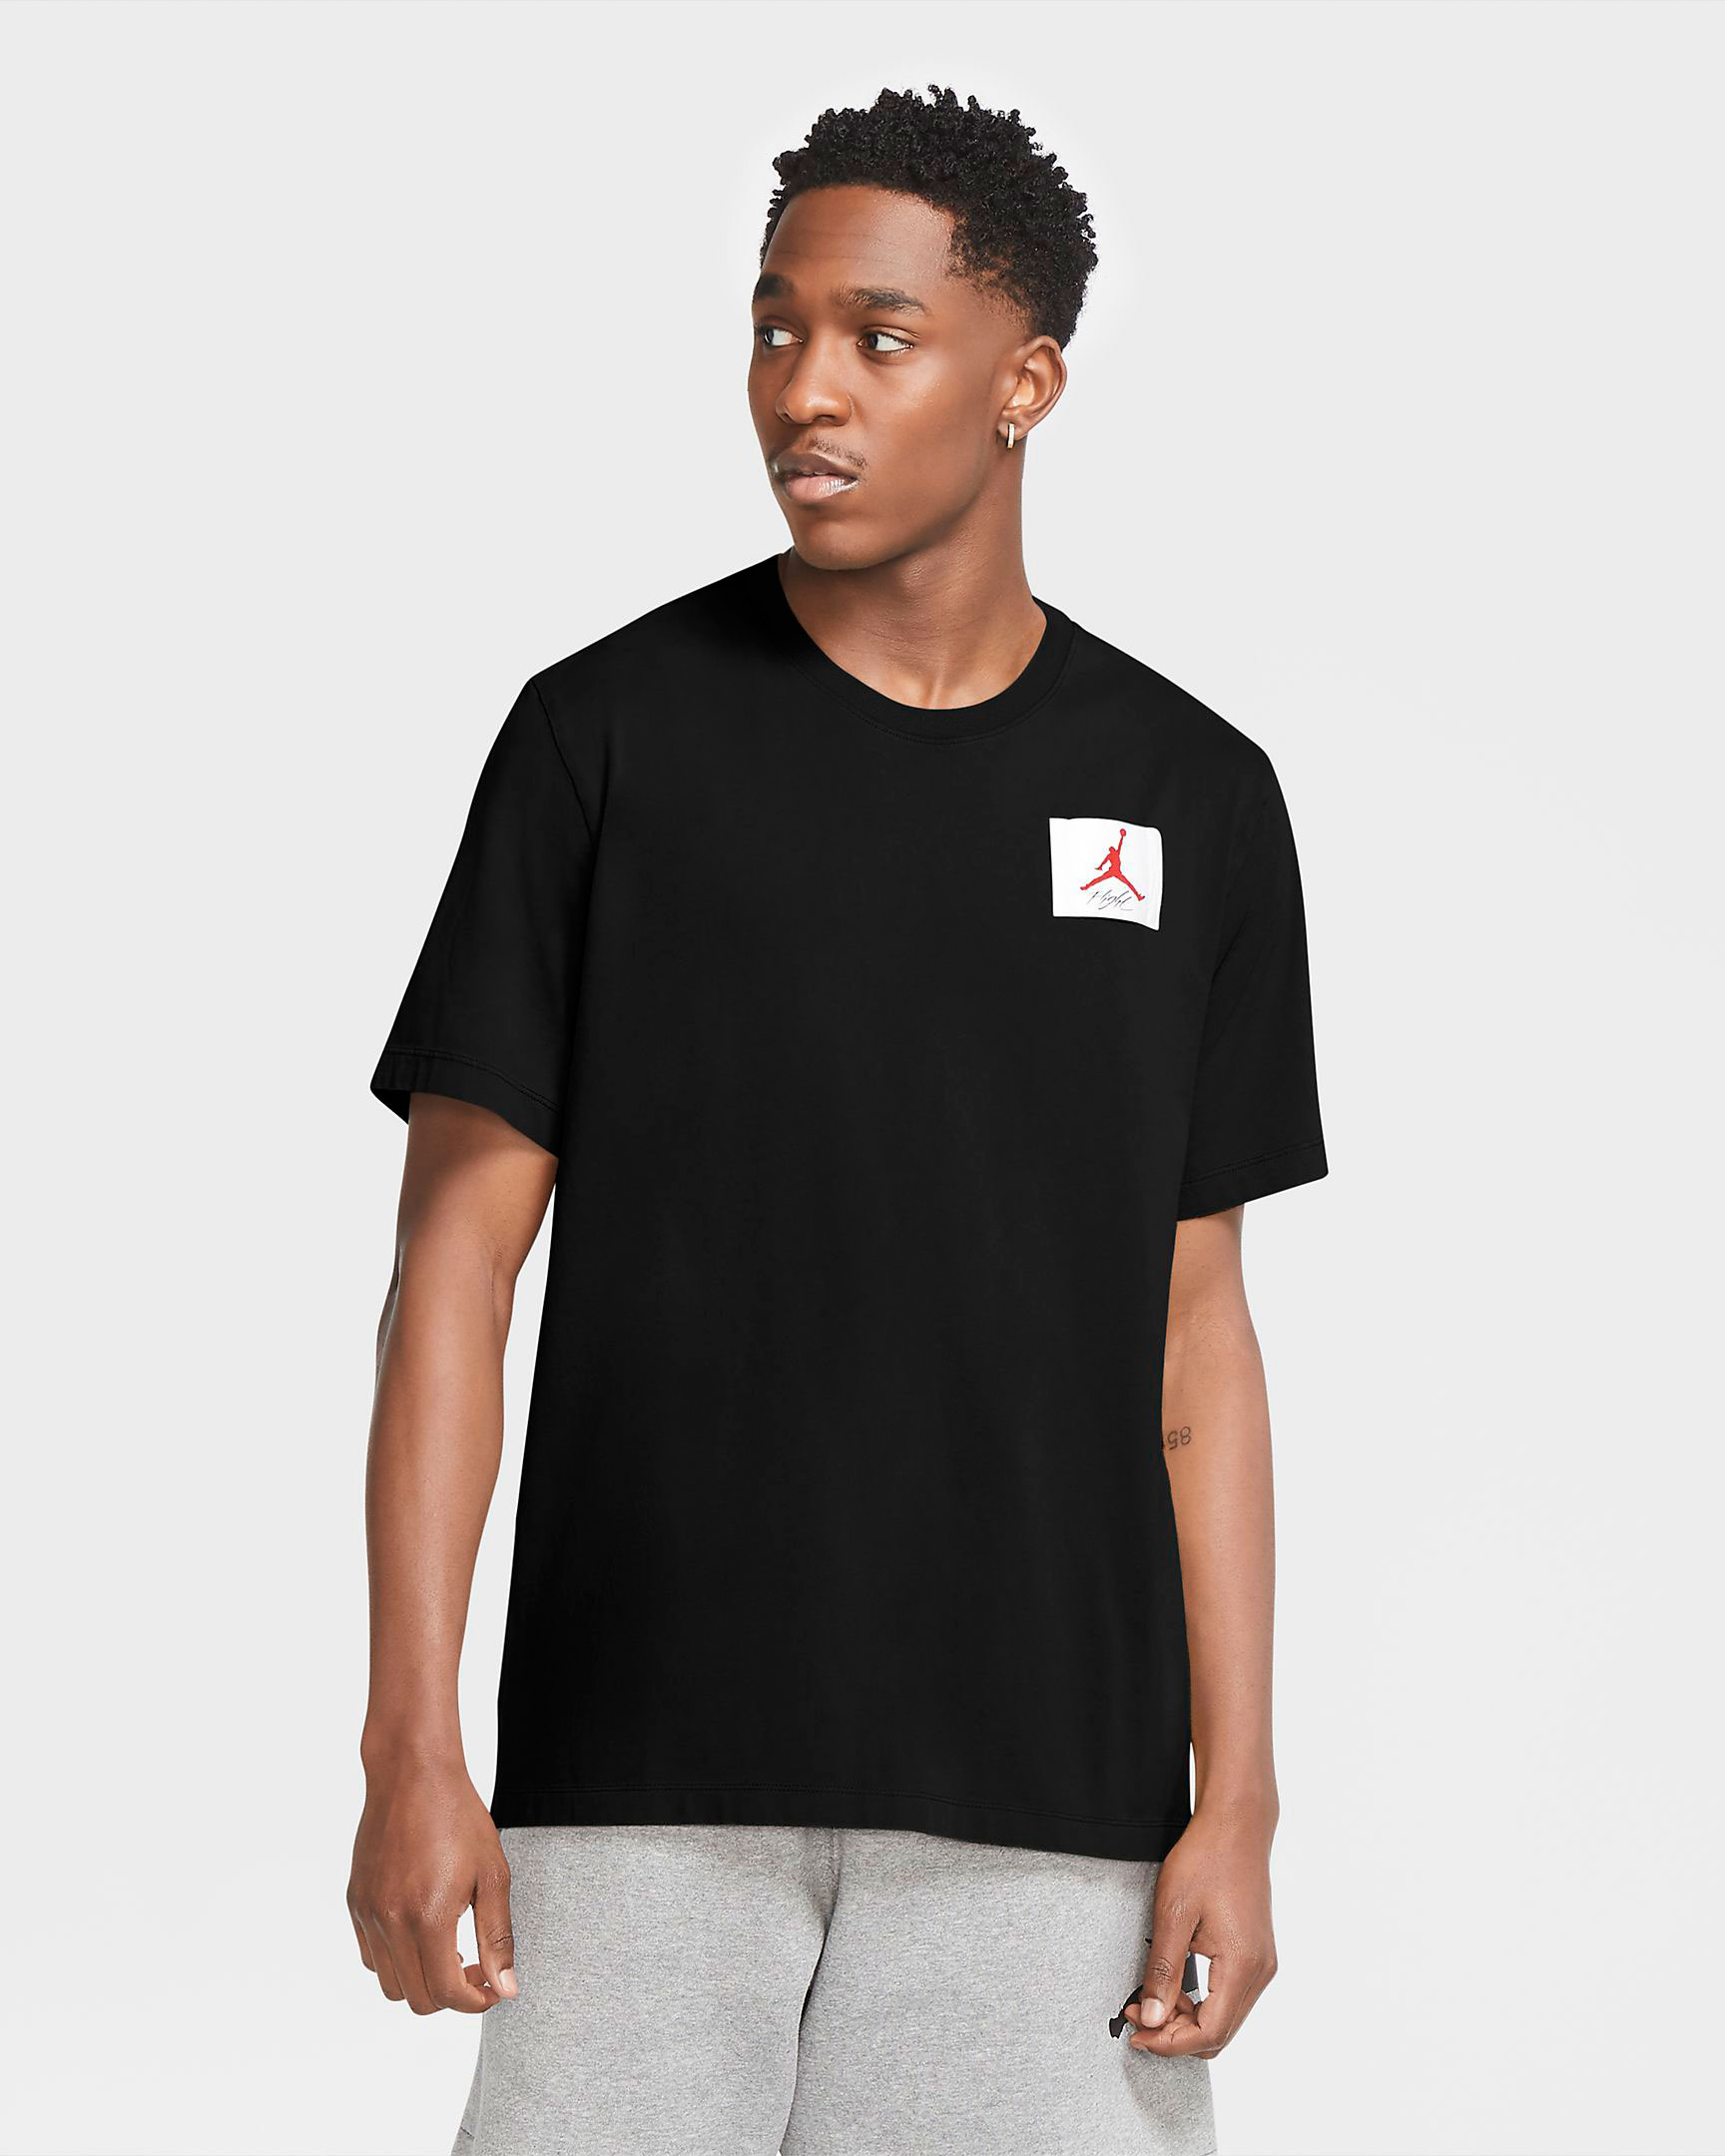 jordan-flight-essentials-shirt-black-red